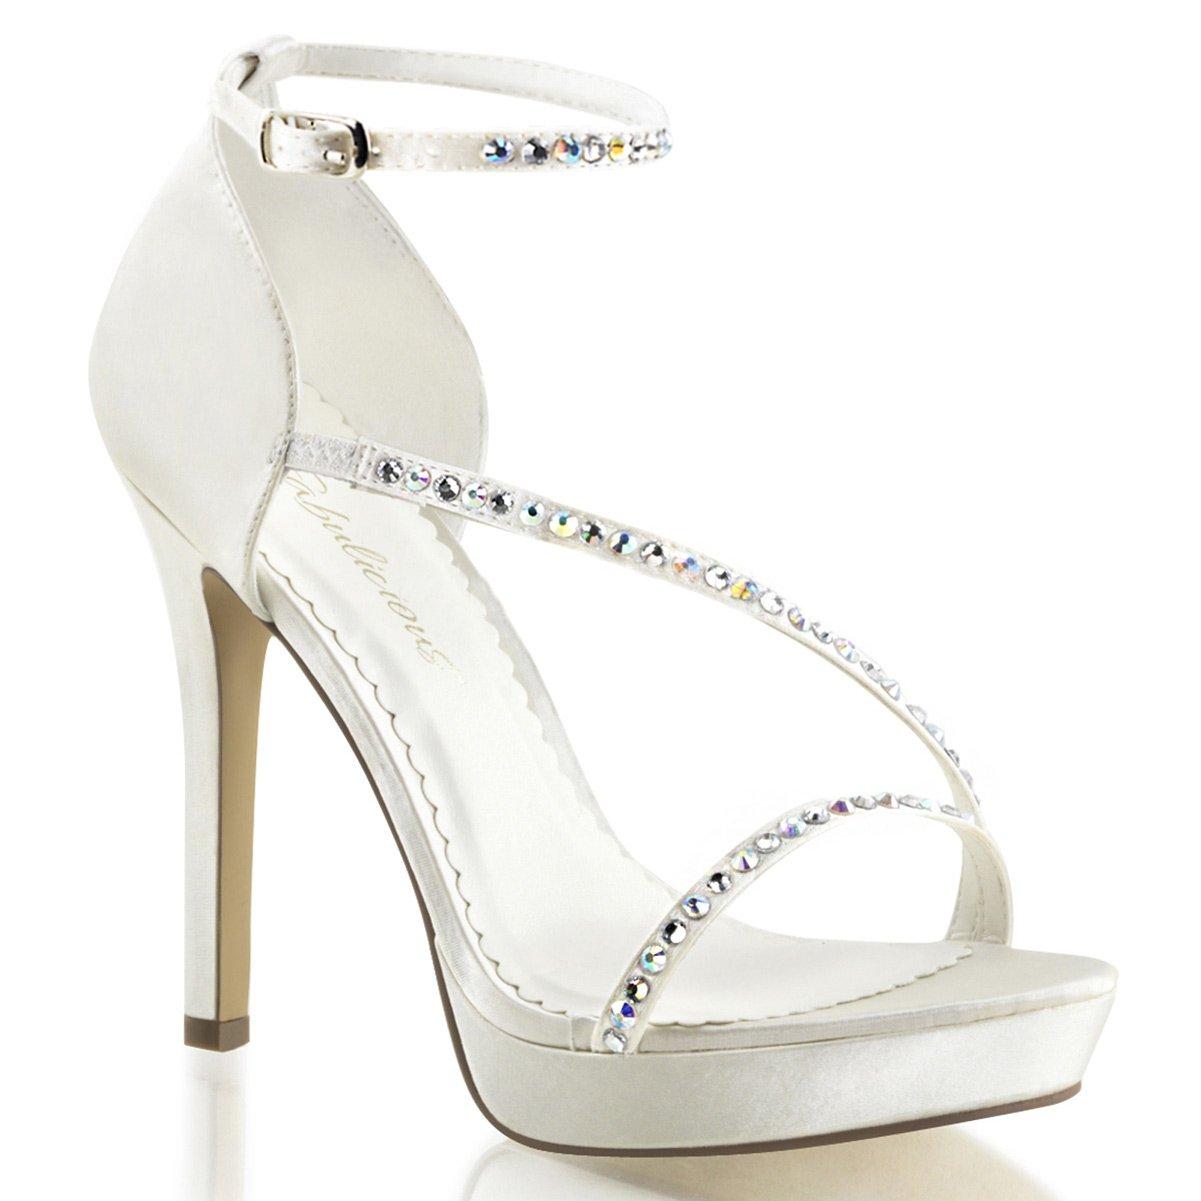 dc716e86a1456 Amazon.com | Summitfashions Womens Ivory White Satin Sandals ...